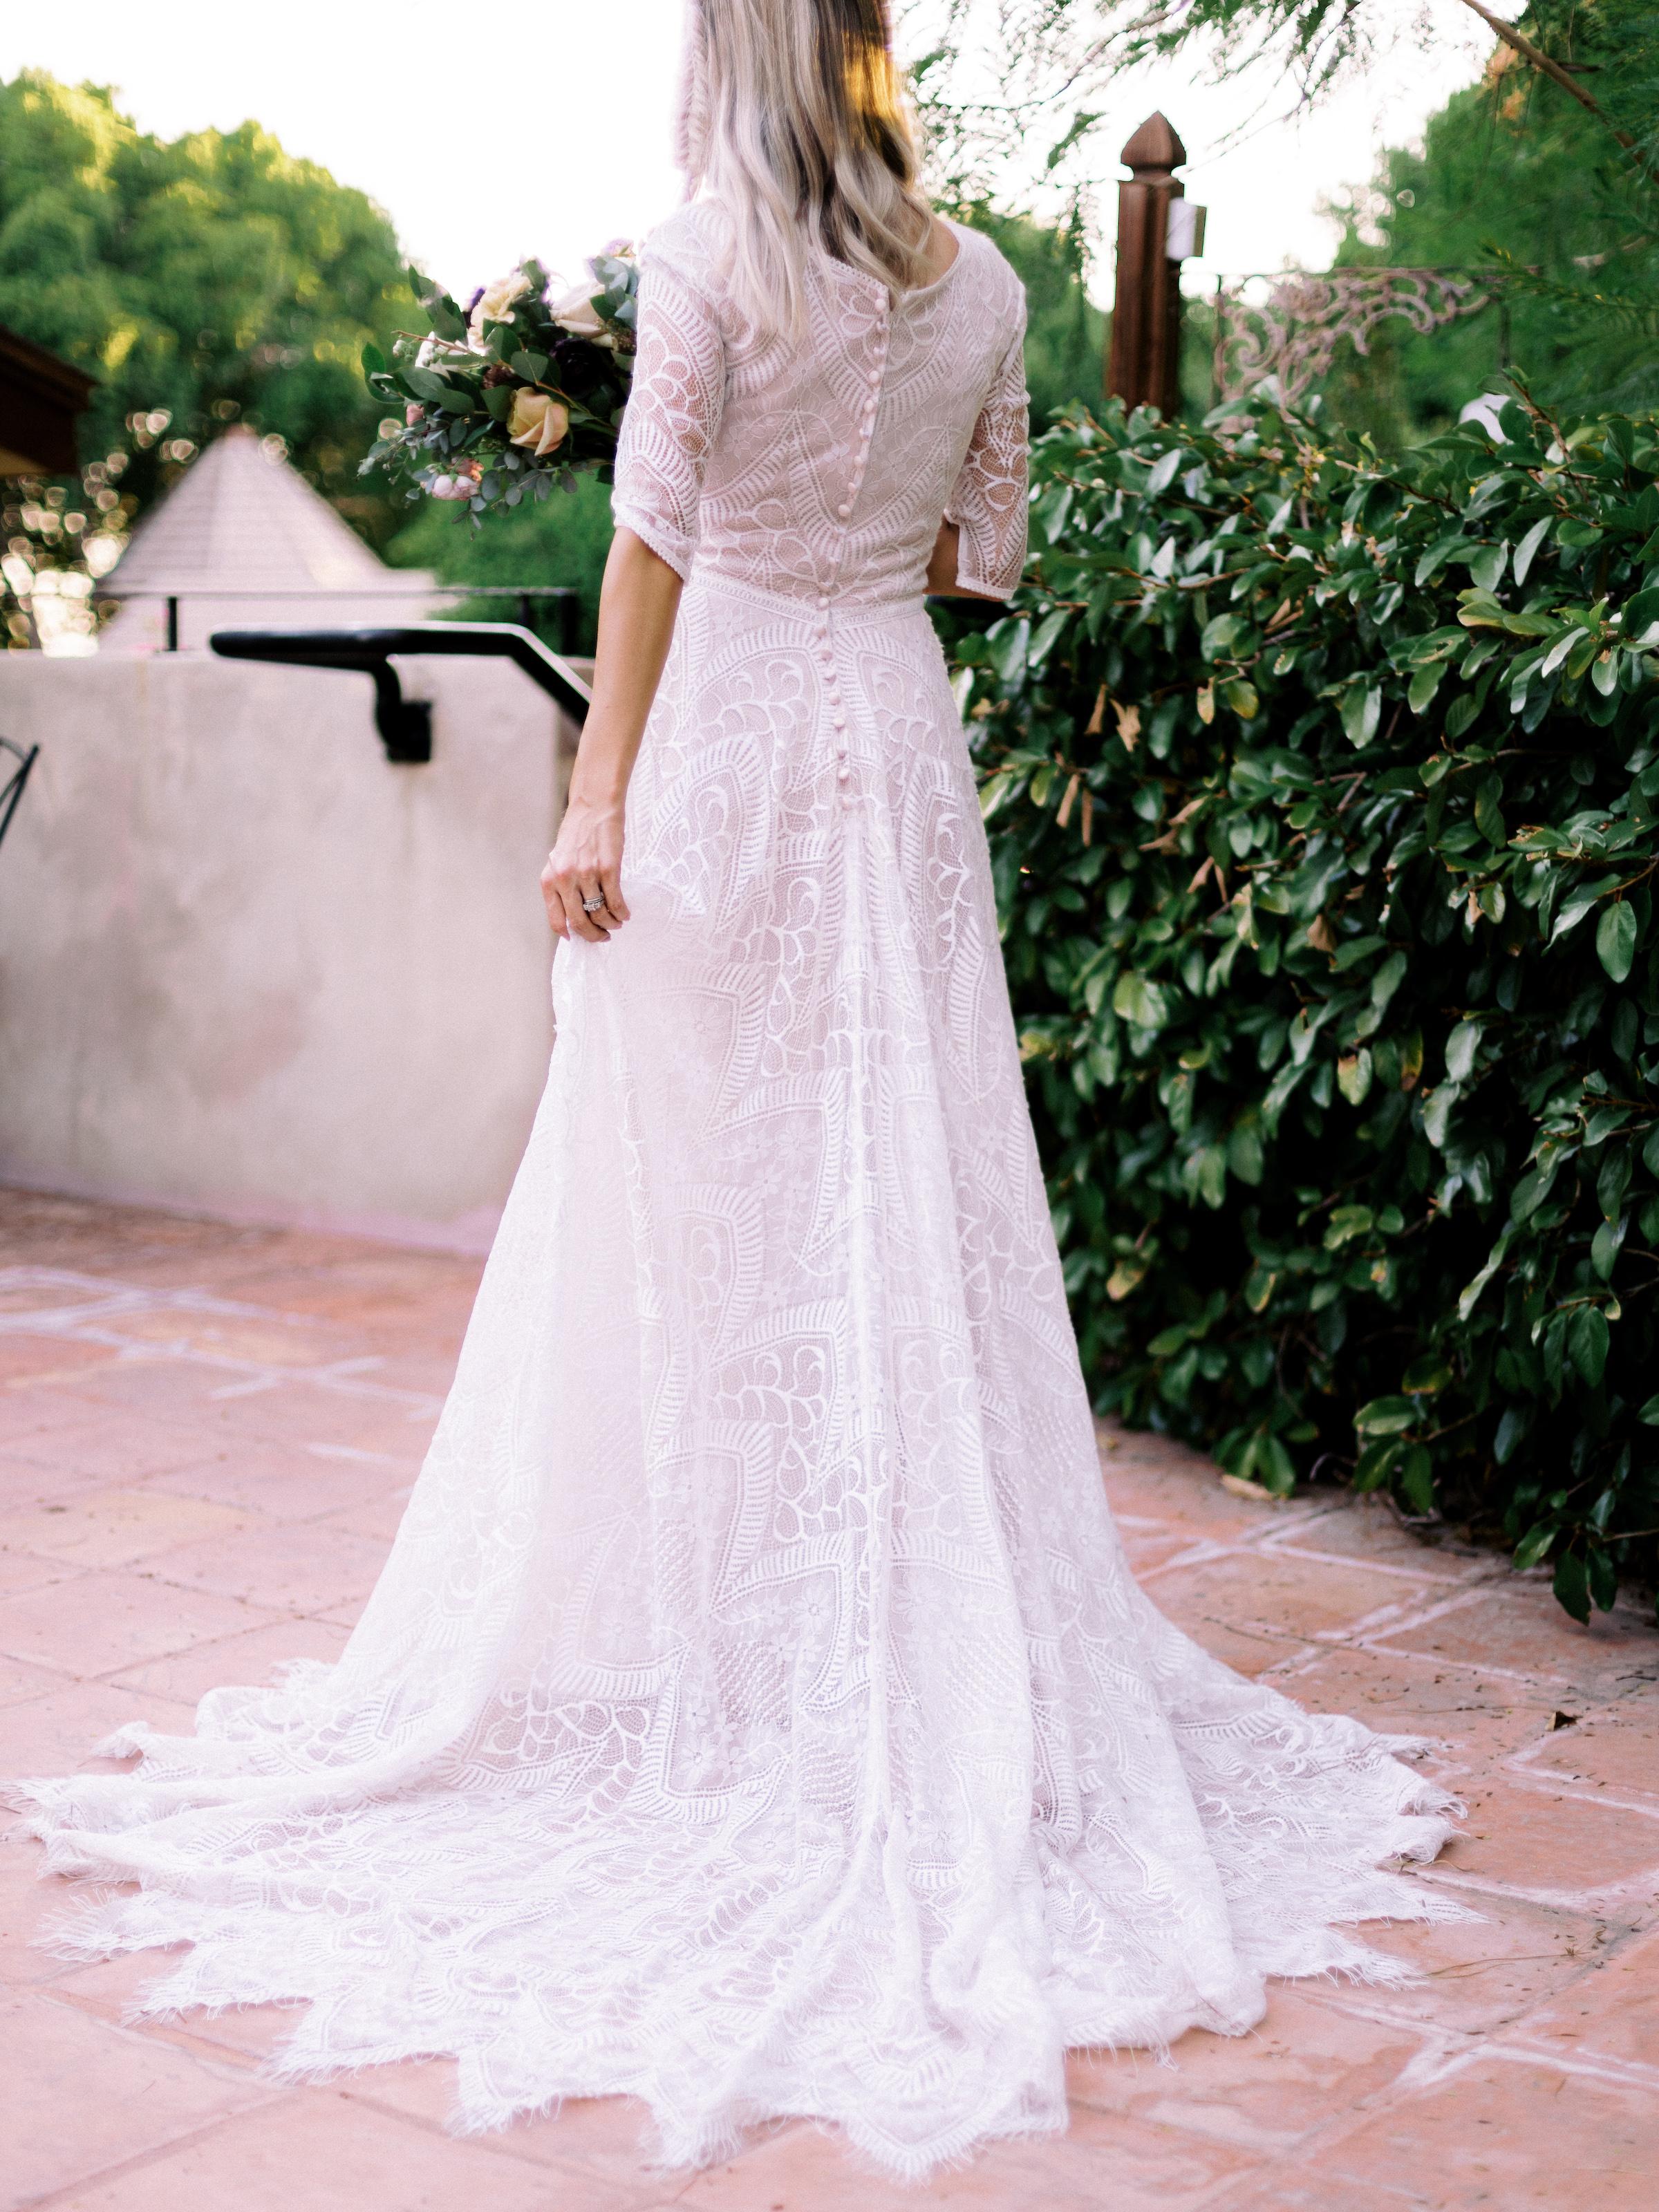 Boho Chic Wedding Dress Long Sleeve Wright House Truth And Beauty Photography